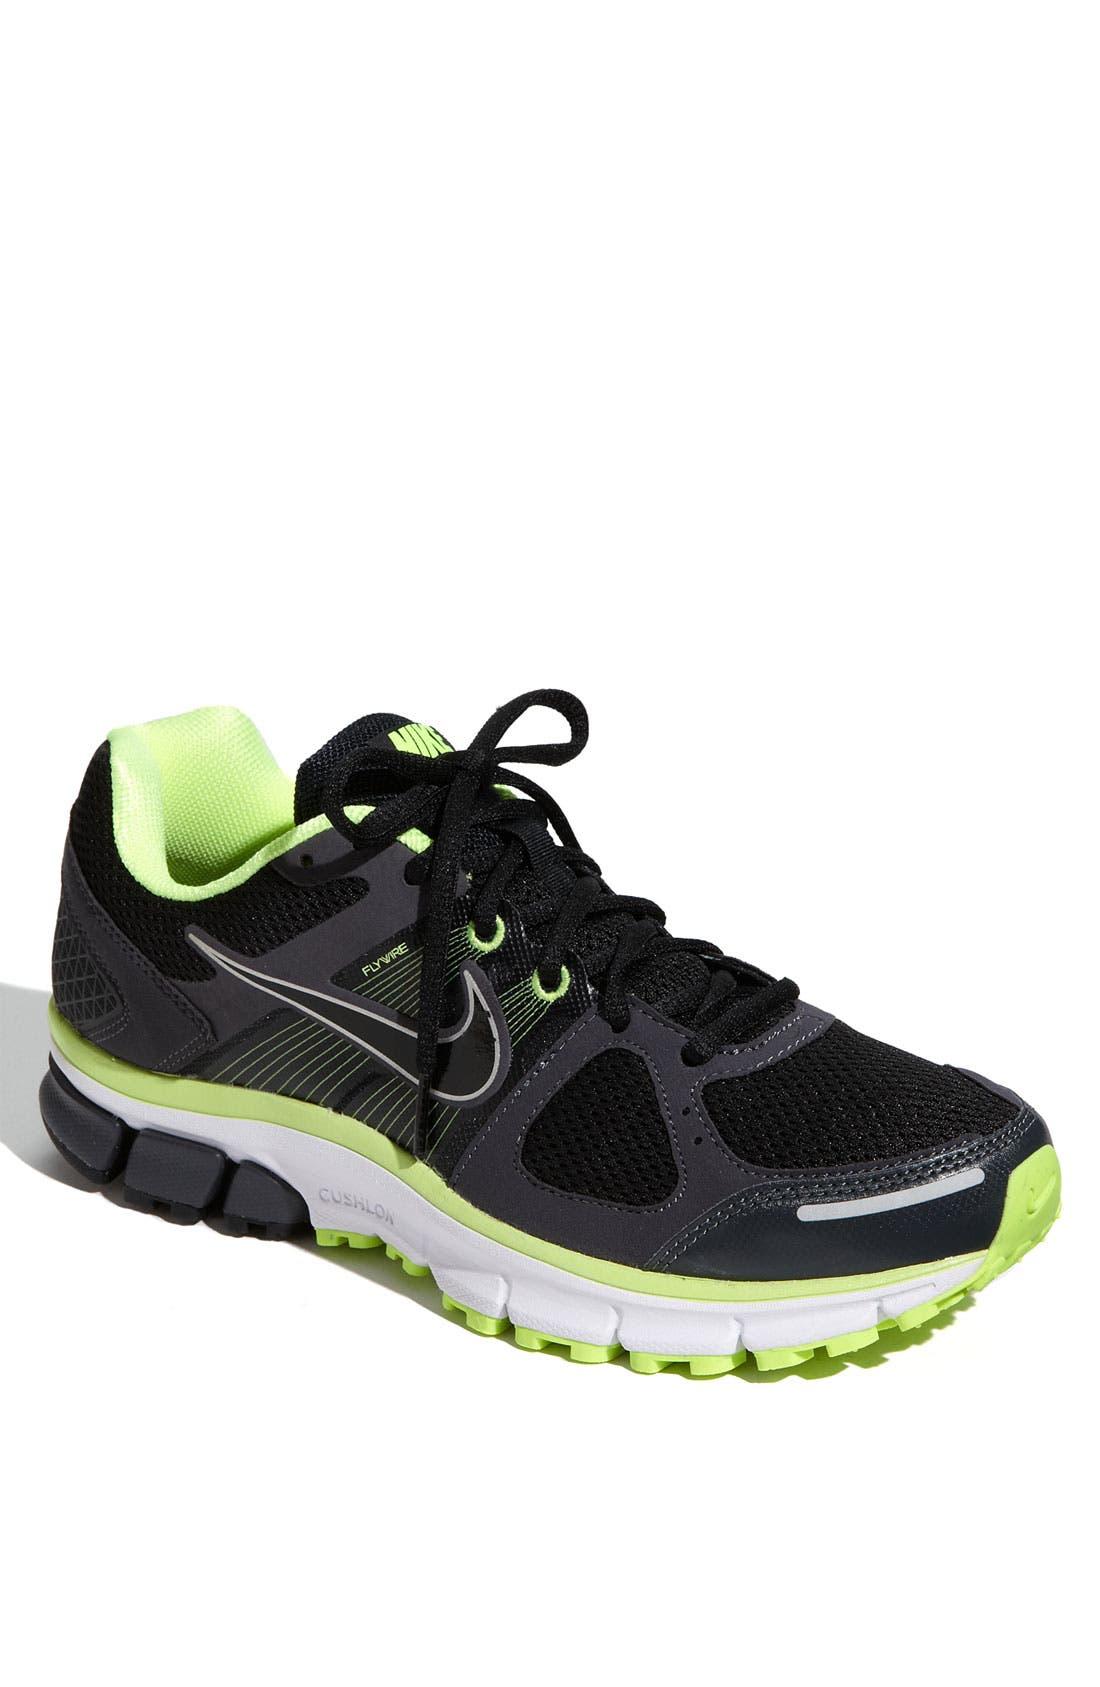 'Air Pegasus+ 28' Trail Running Shoe,                             Main thumbnail 1, color,                             002